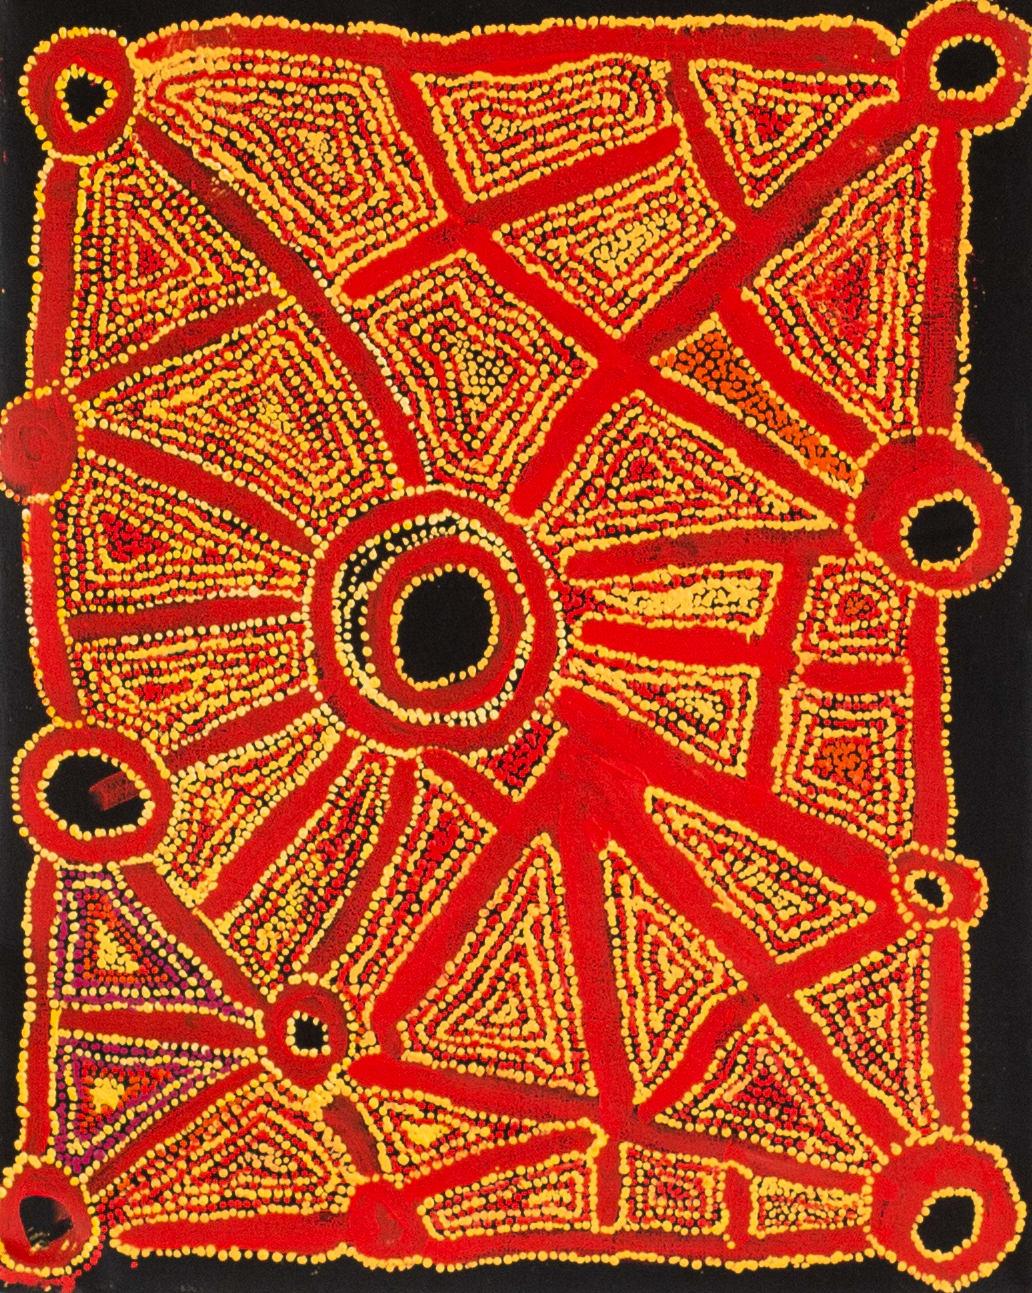 Kathleen (Kanta) Donnegan Upunya, 2018 Acrylic on linen 60 x 75 cm